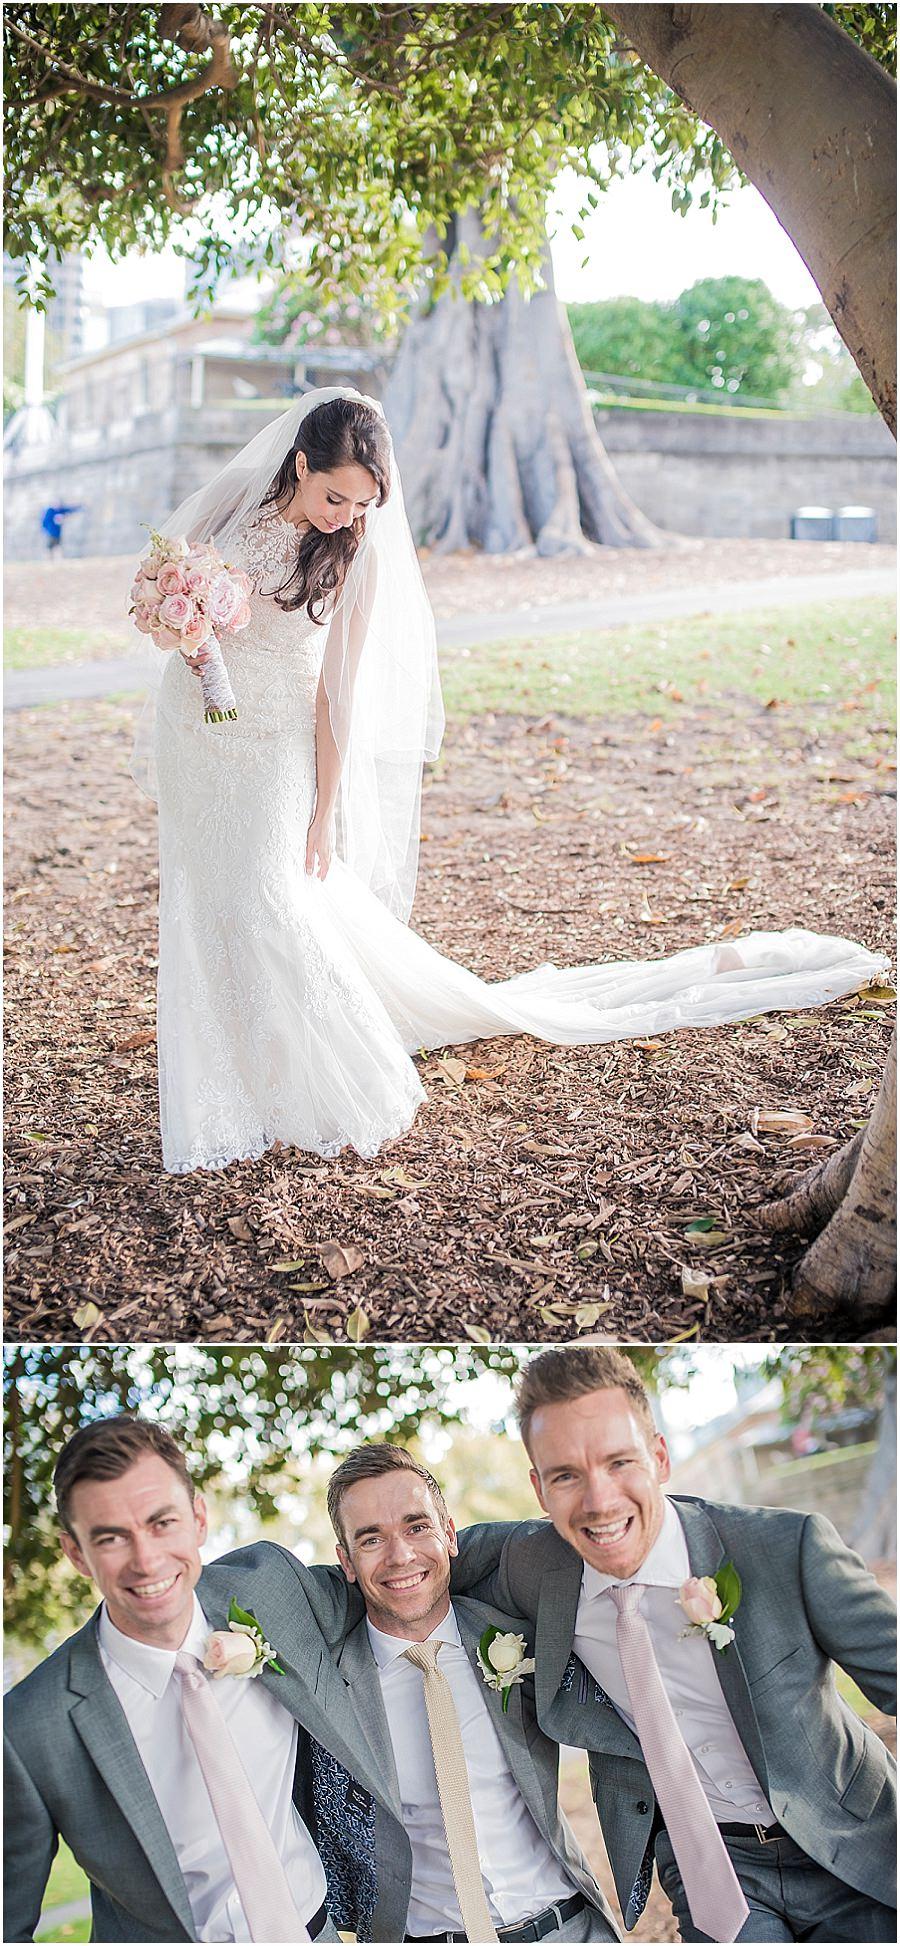 33-the-view-wedding-photos-sydney